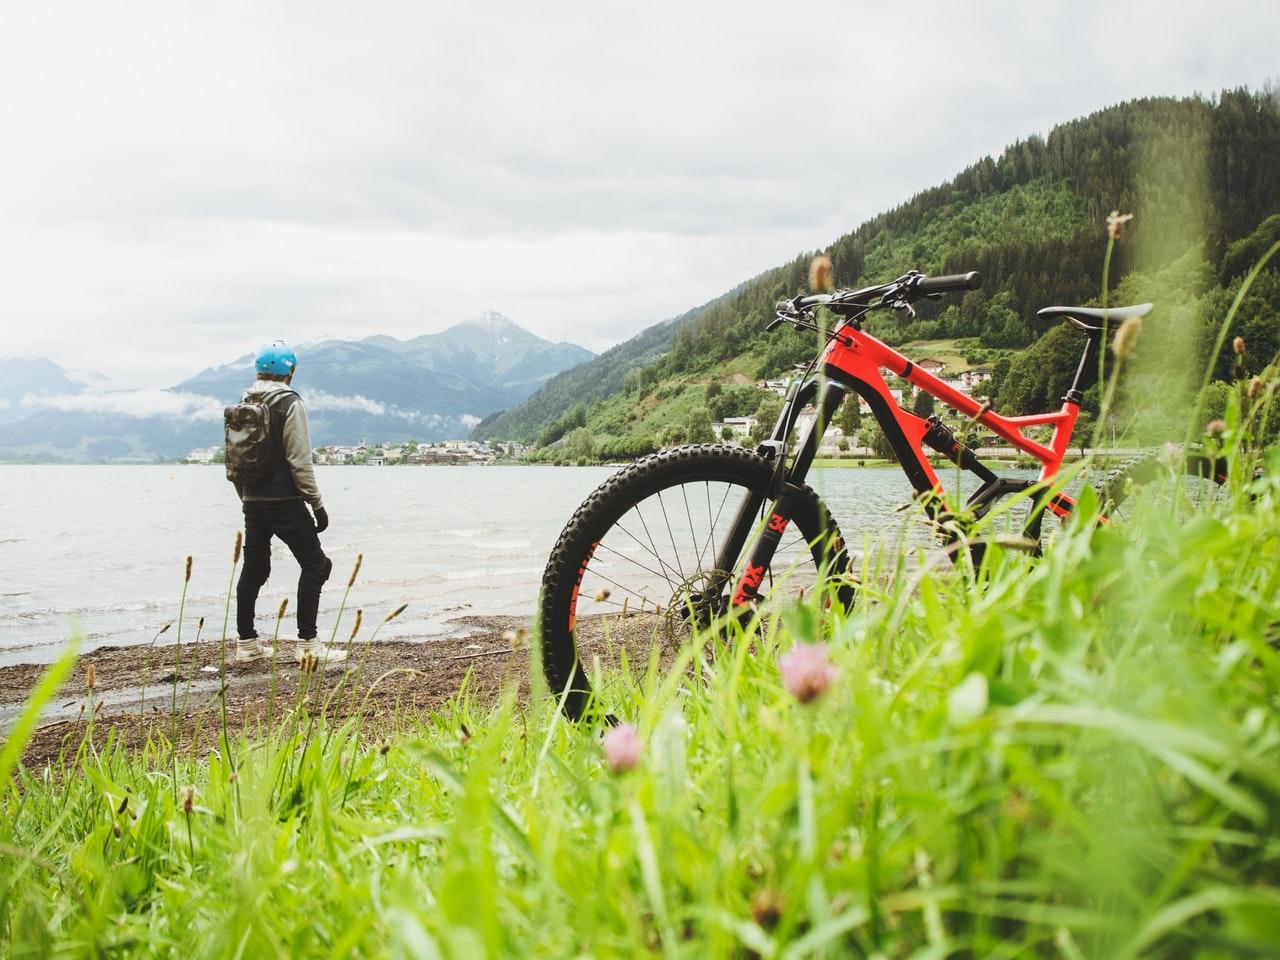 Biking-During-Active-Vacation